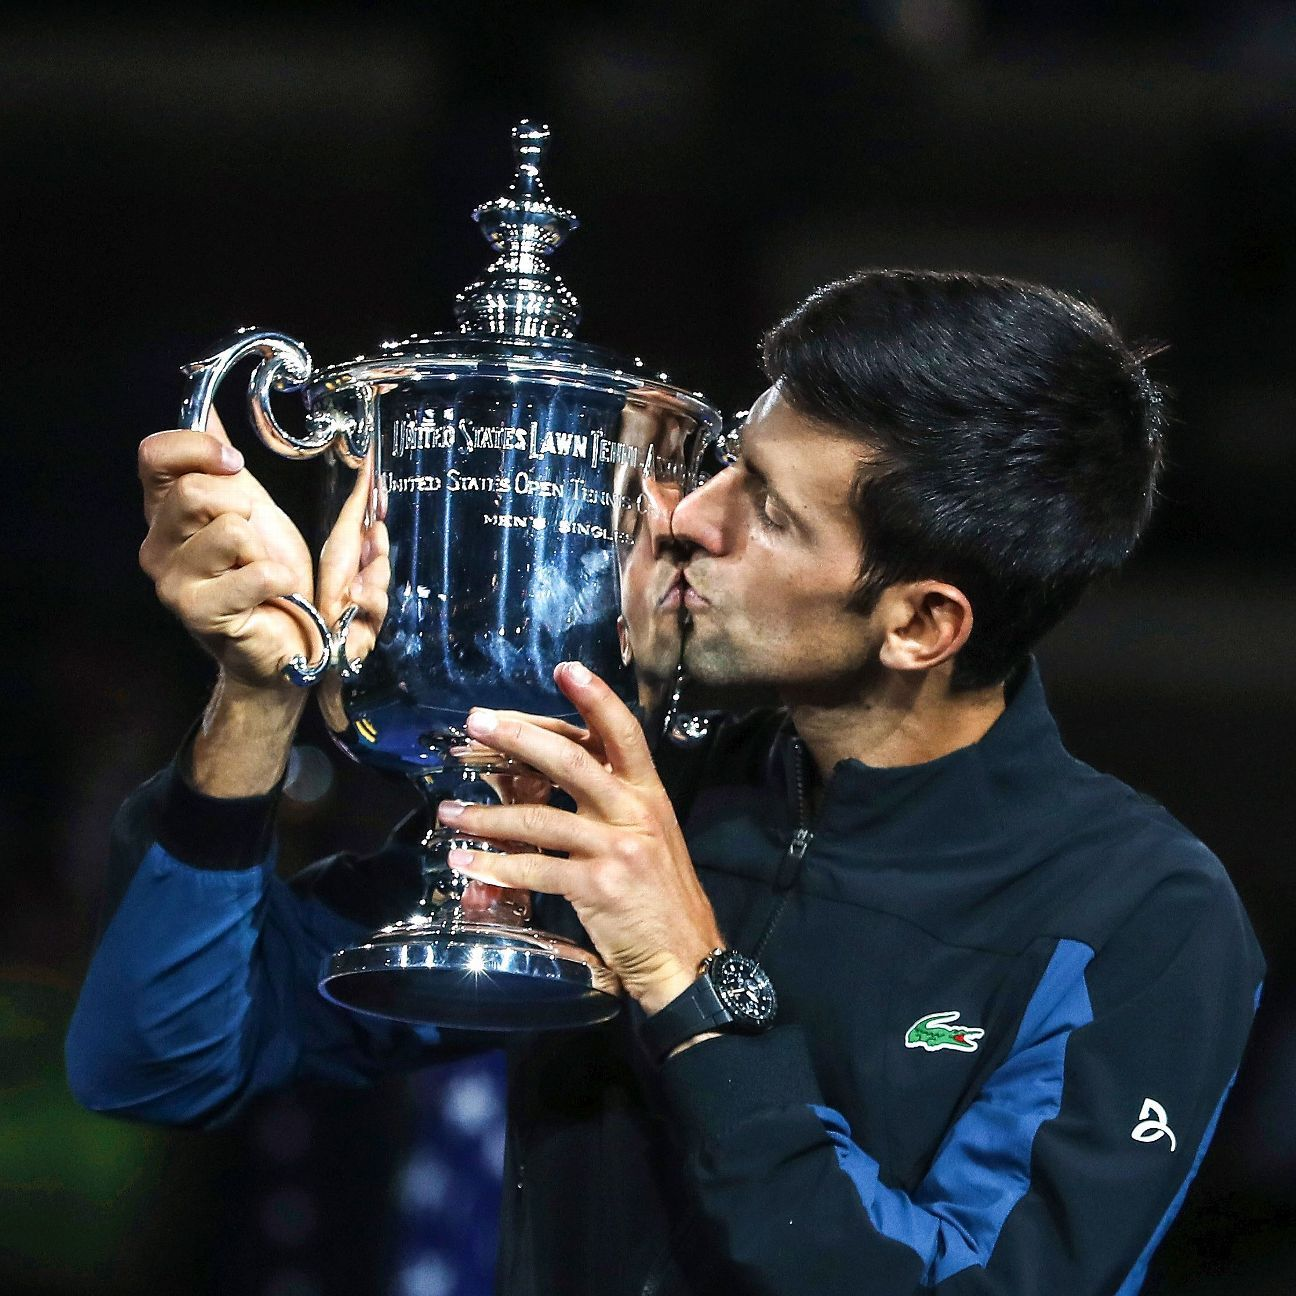 Novak Djokovic Tops Juan Martin Del Potro In Straight Sets To Win Third US Open Title